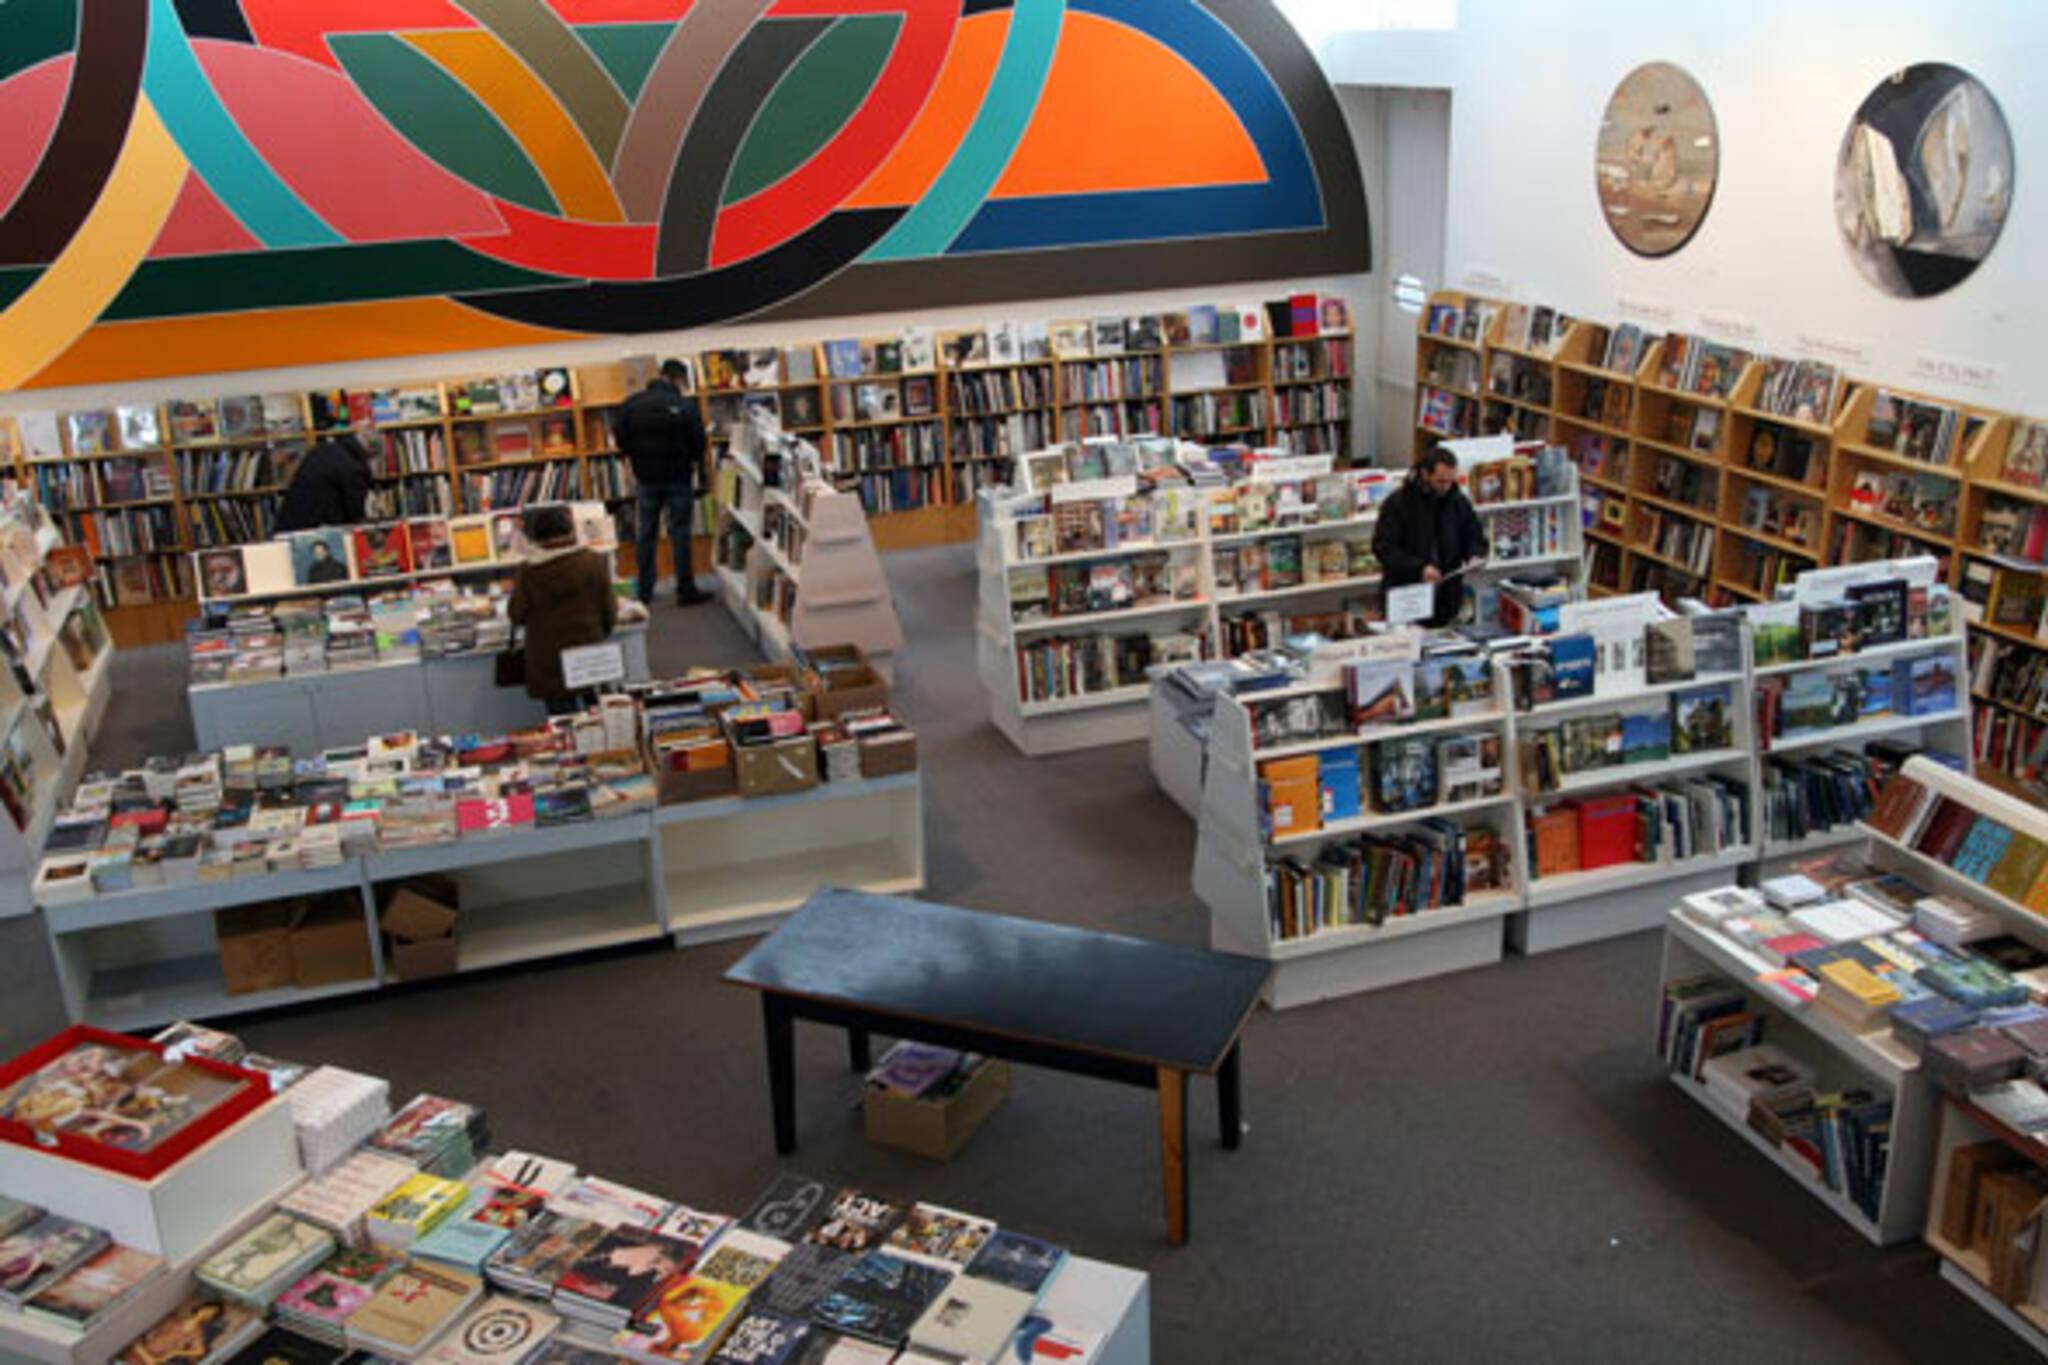 David Mirvish Books